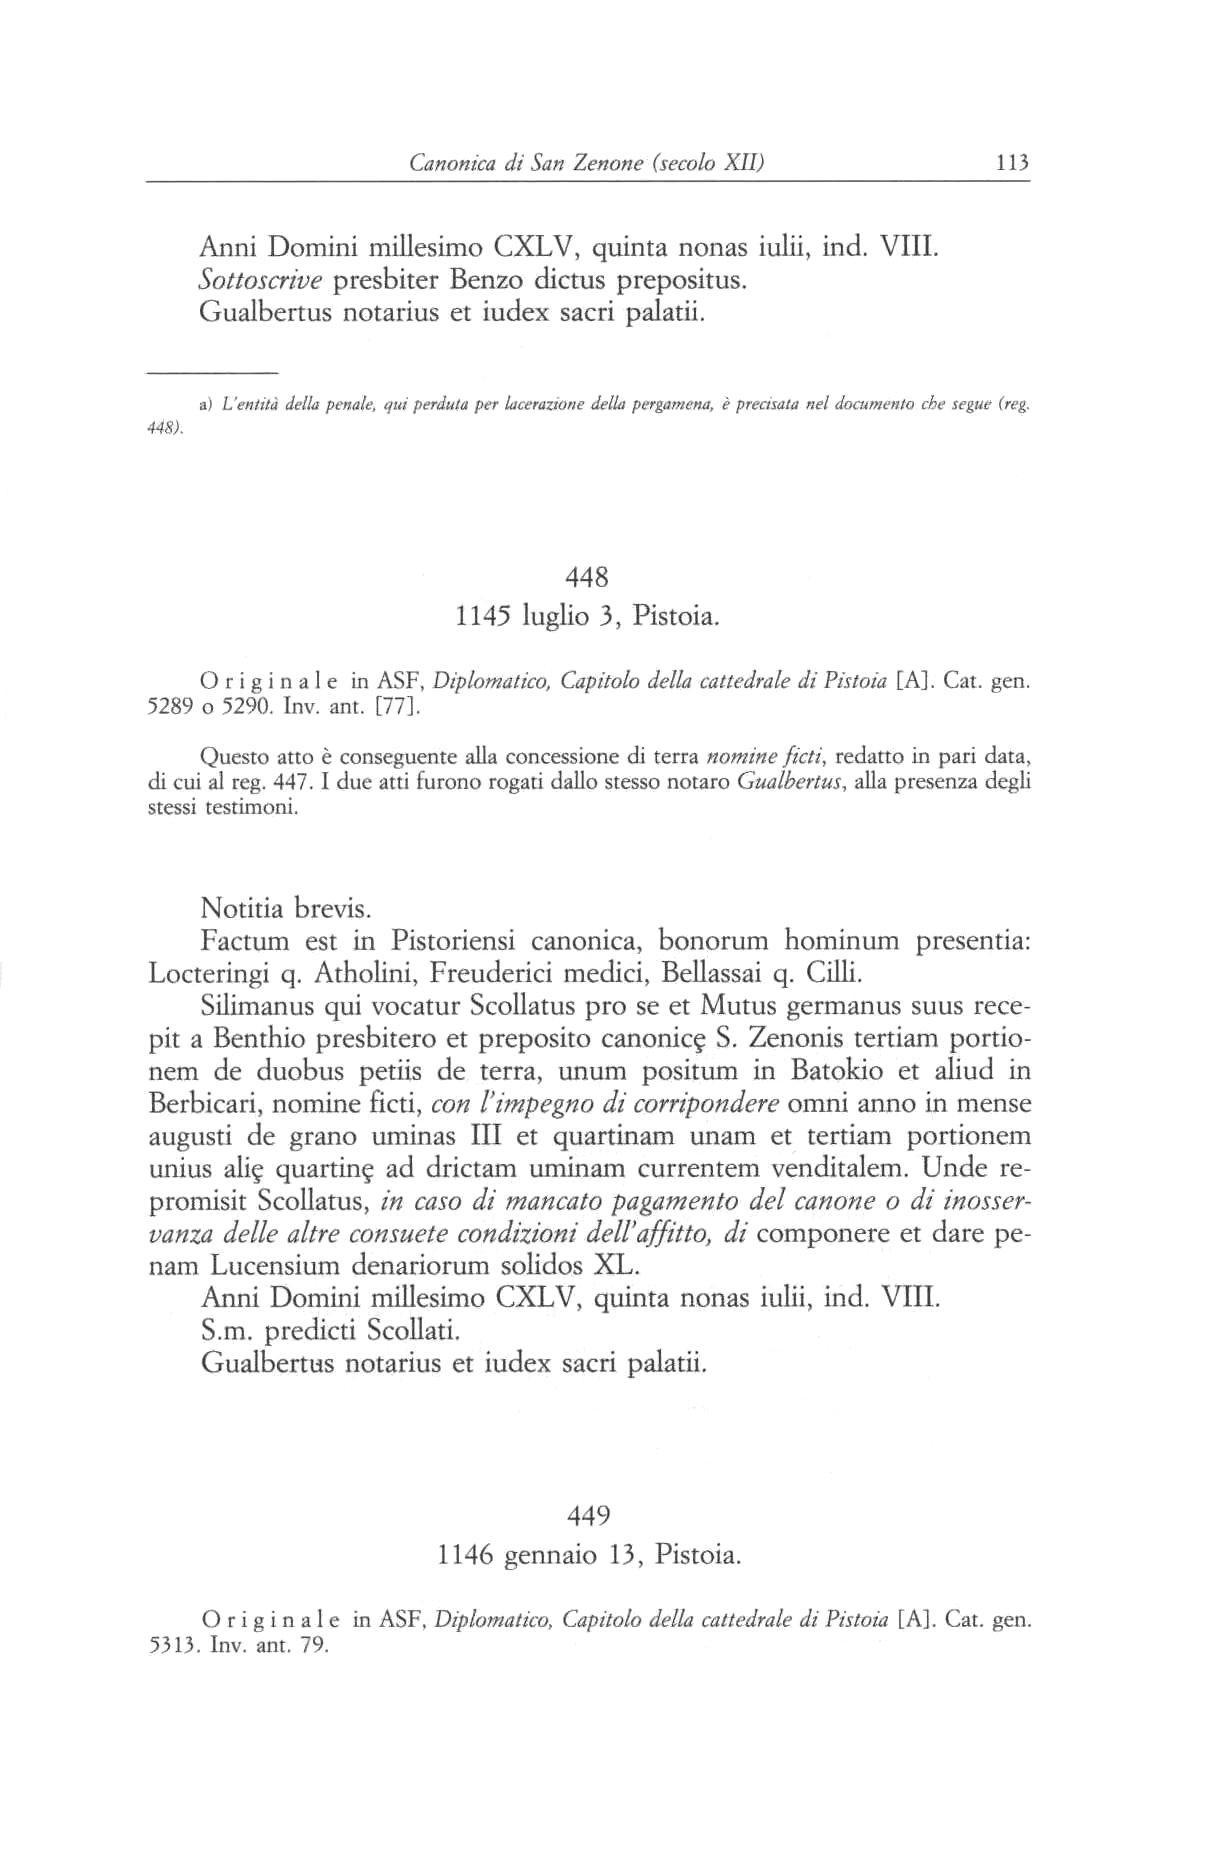 Canonica S. Zenone XII 0113.jpg